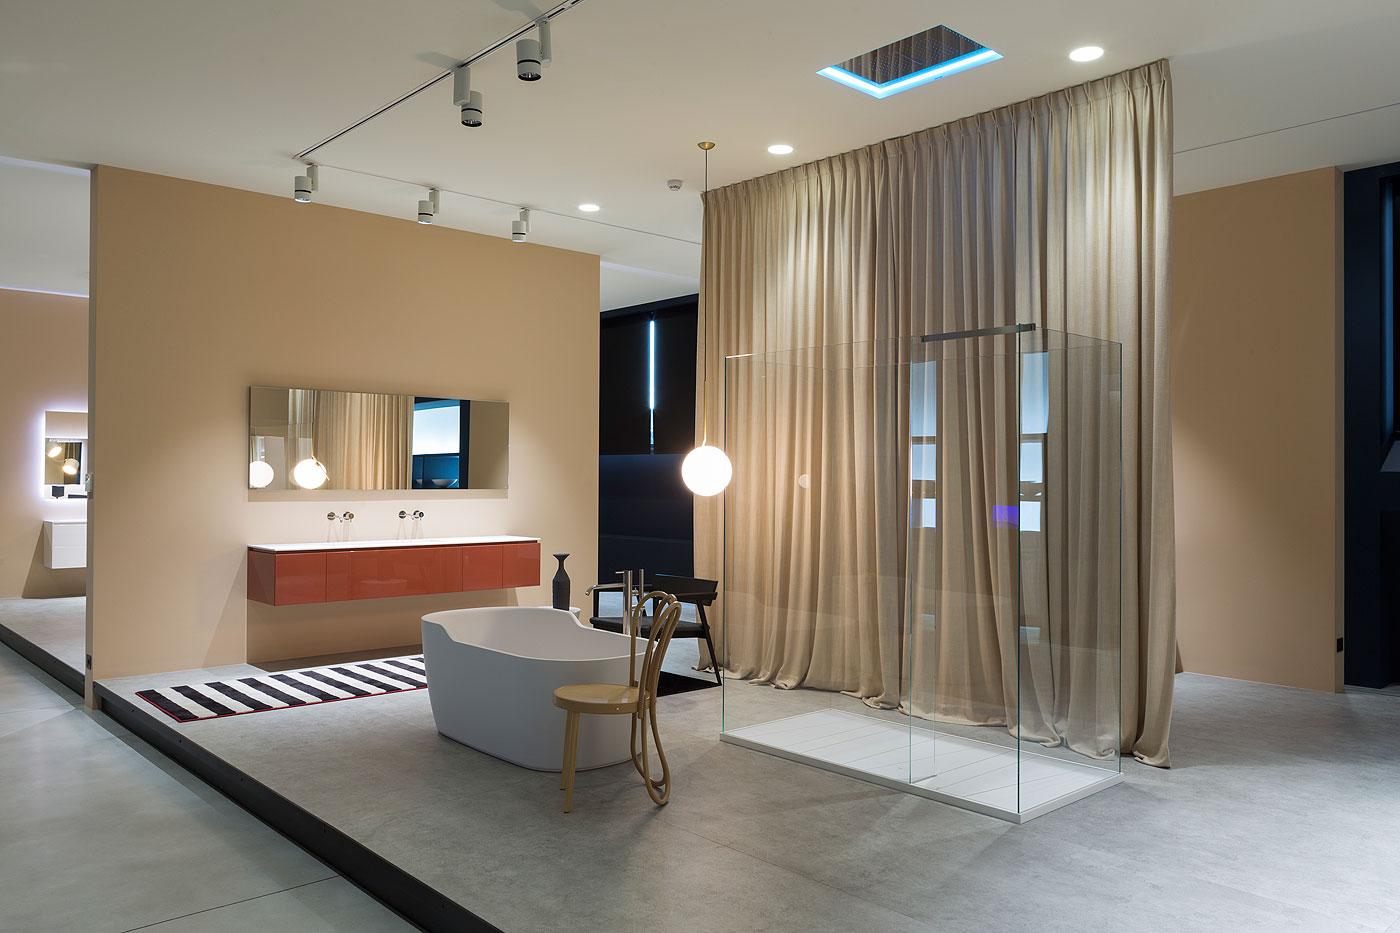 showroom-corporativo-antoniolupi-stabbia (3)